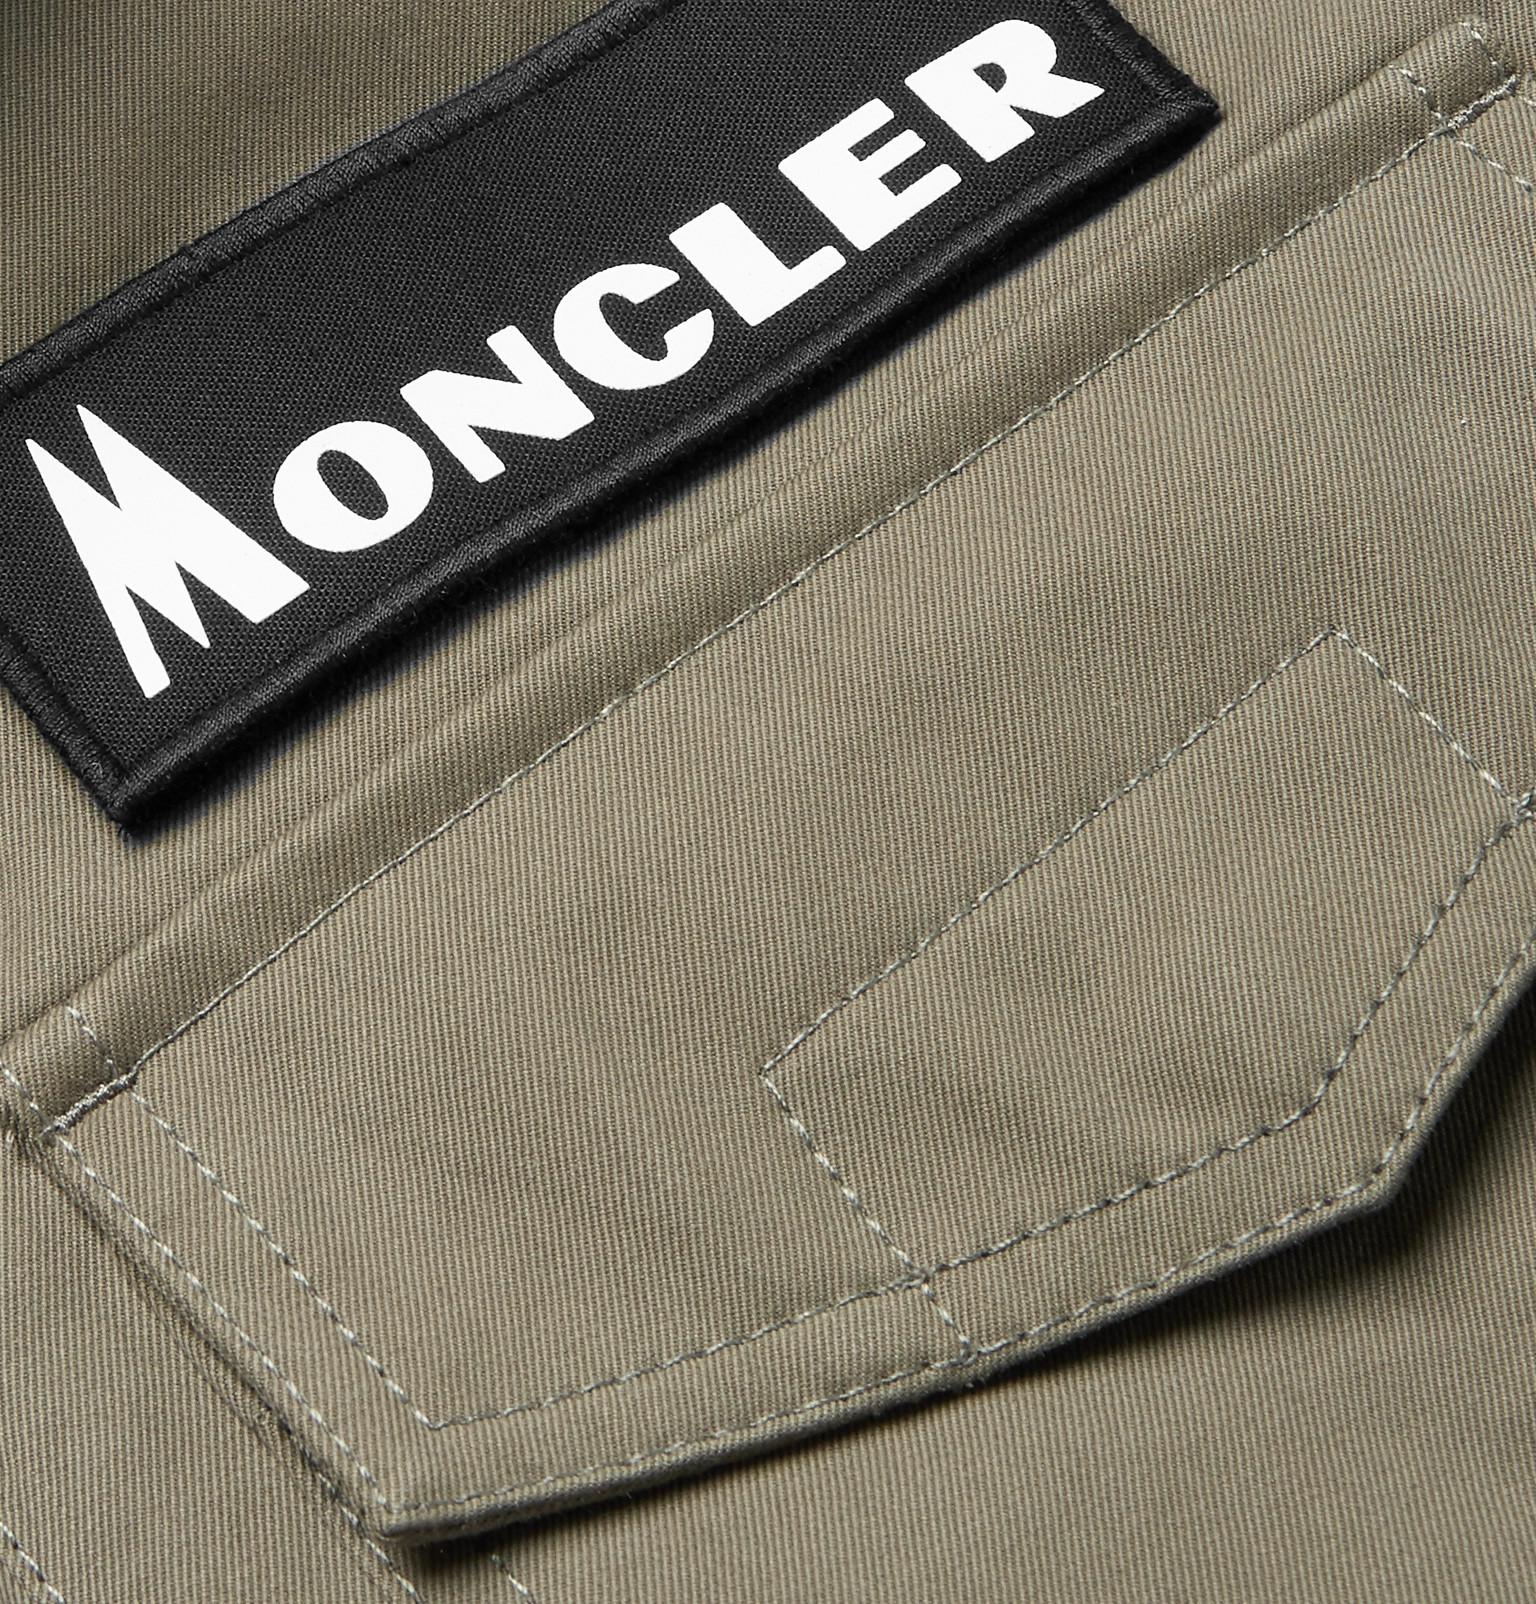 bc6457a13 Moncler Genius - 7 Moncler Fragment Davis Twill Down Field Jacket